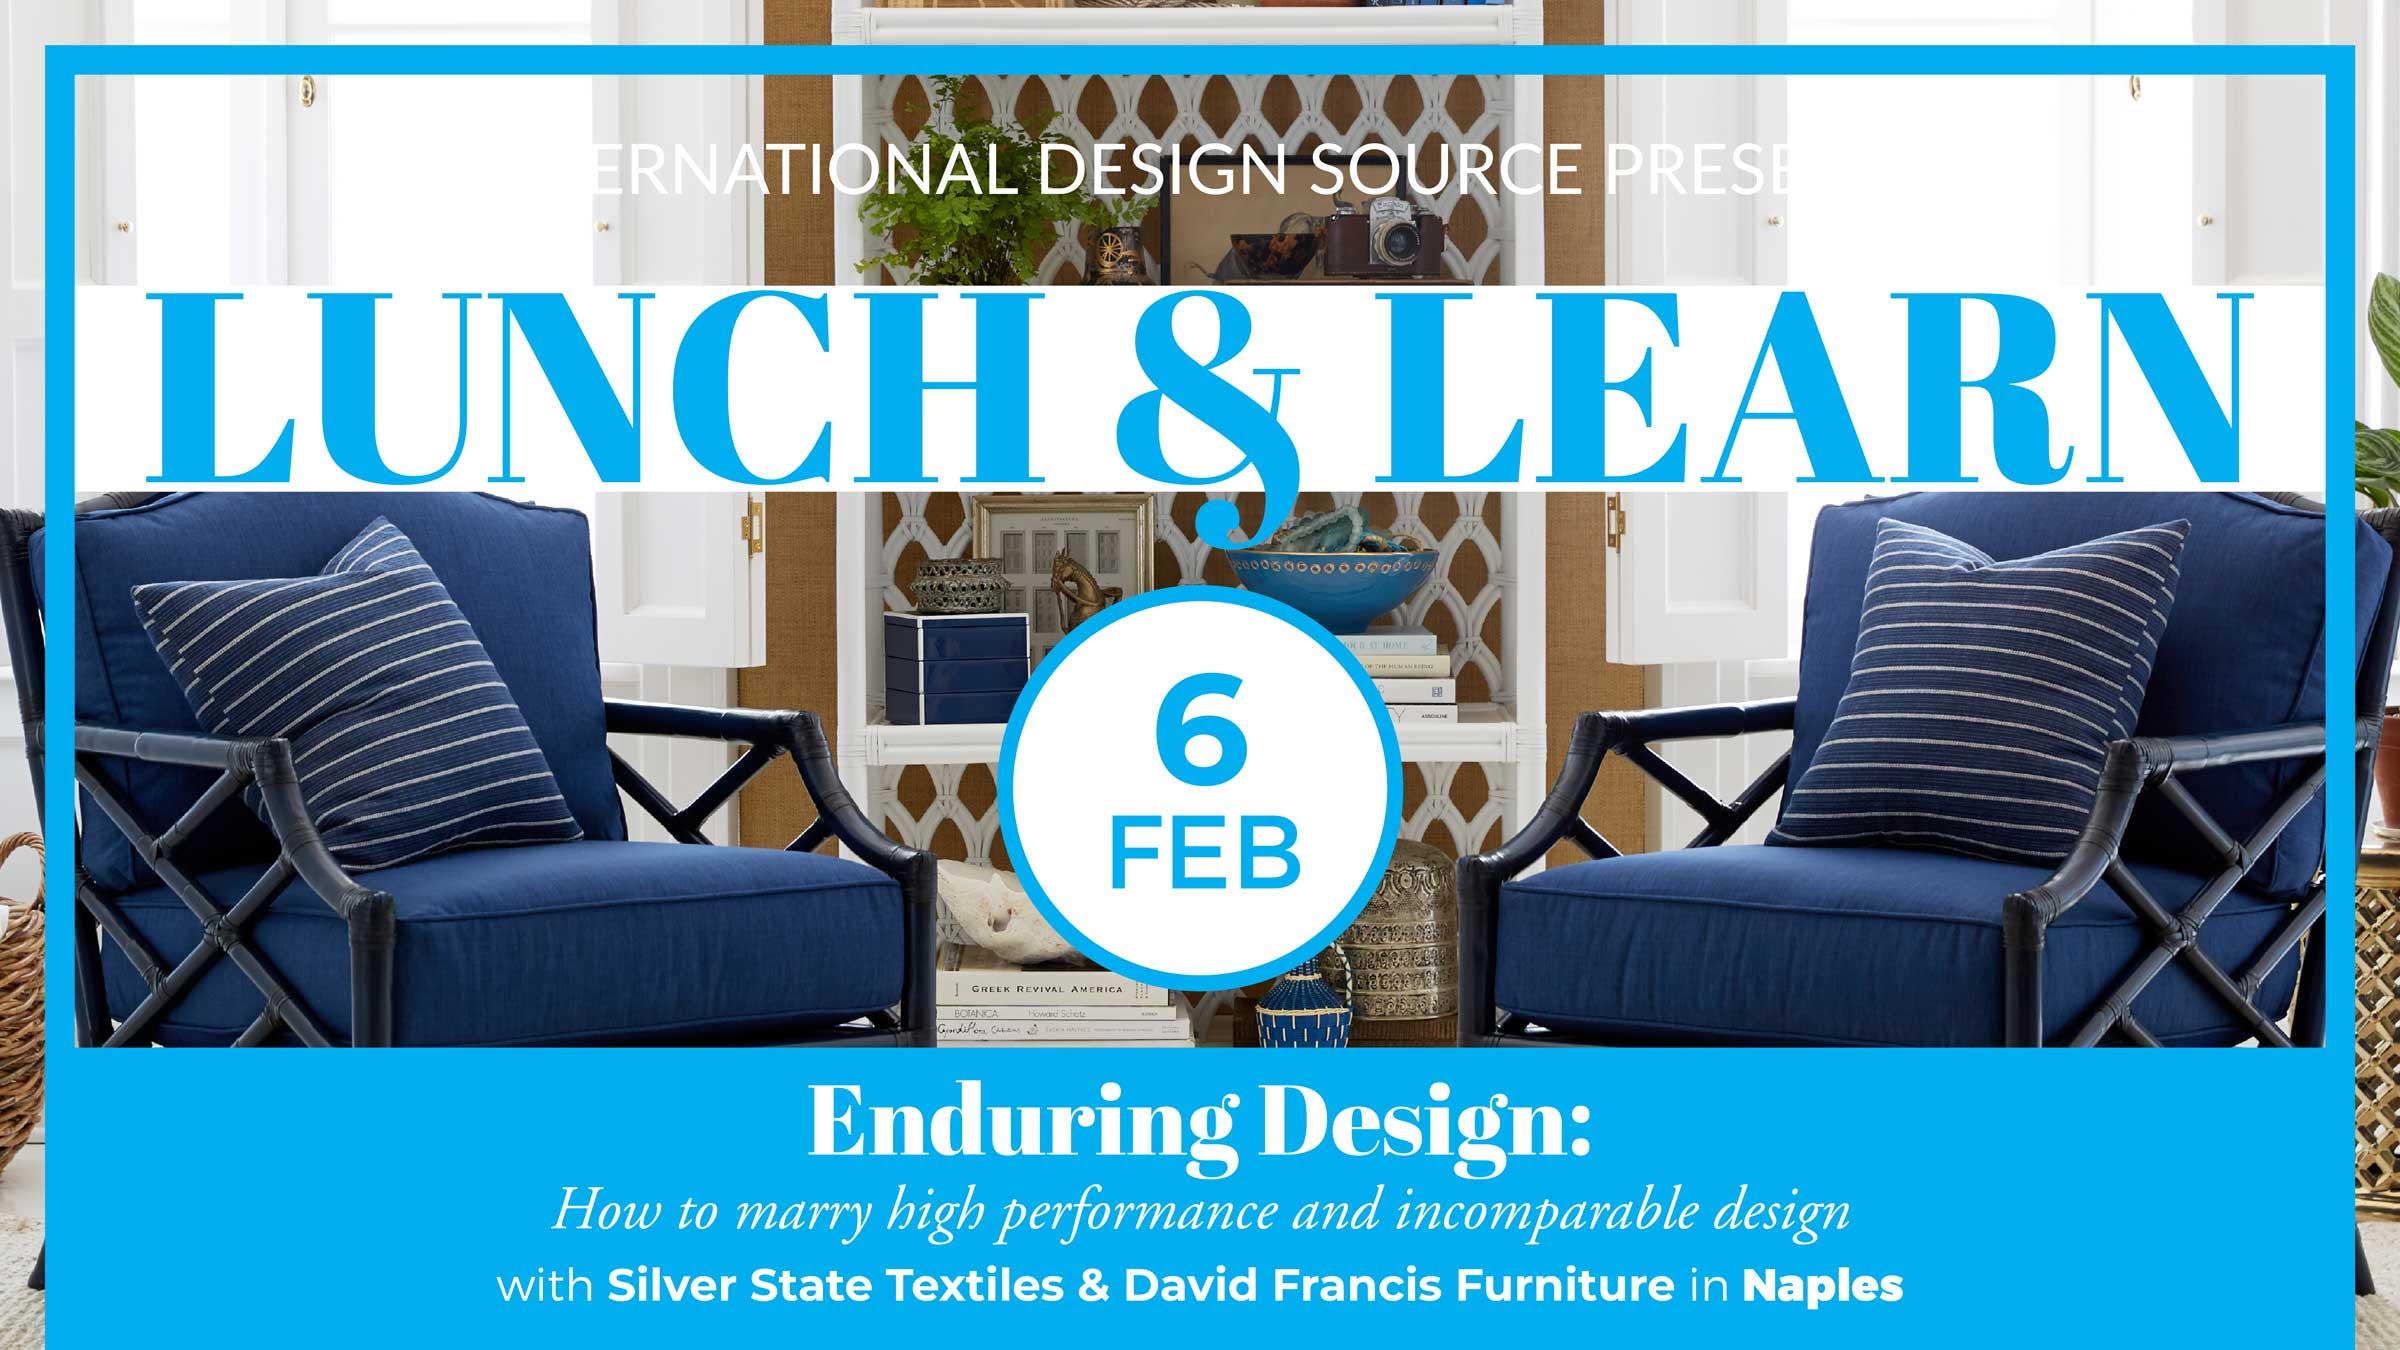 Event International Design Source